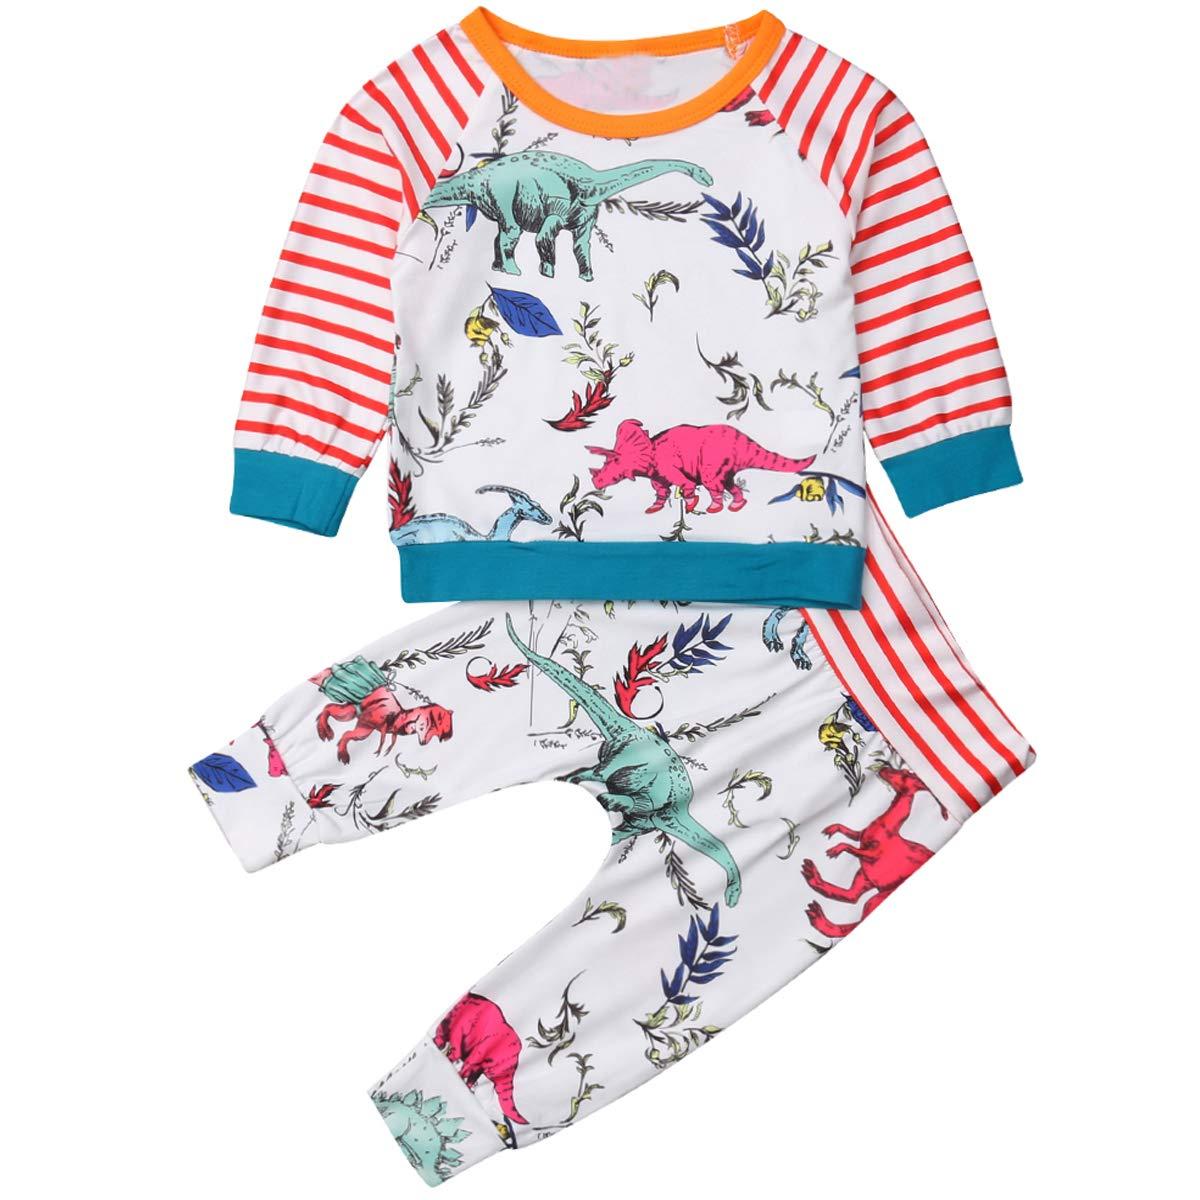 bd098aa06 Amazon.com: Dinosaur Baby Boy Outfit, Newborn Baby Animal Striped Shirt Top  Legging Pants 2pcs Baby Dino Clothes: Clothing